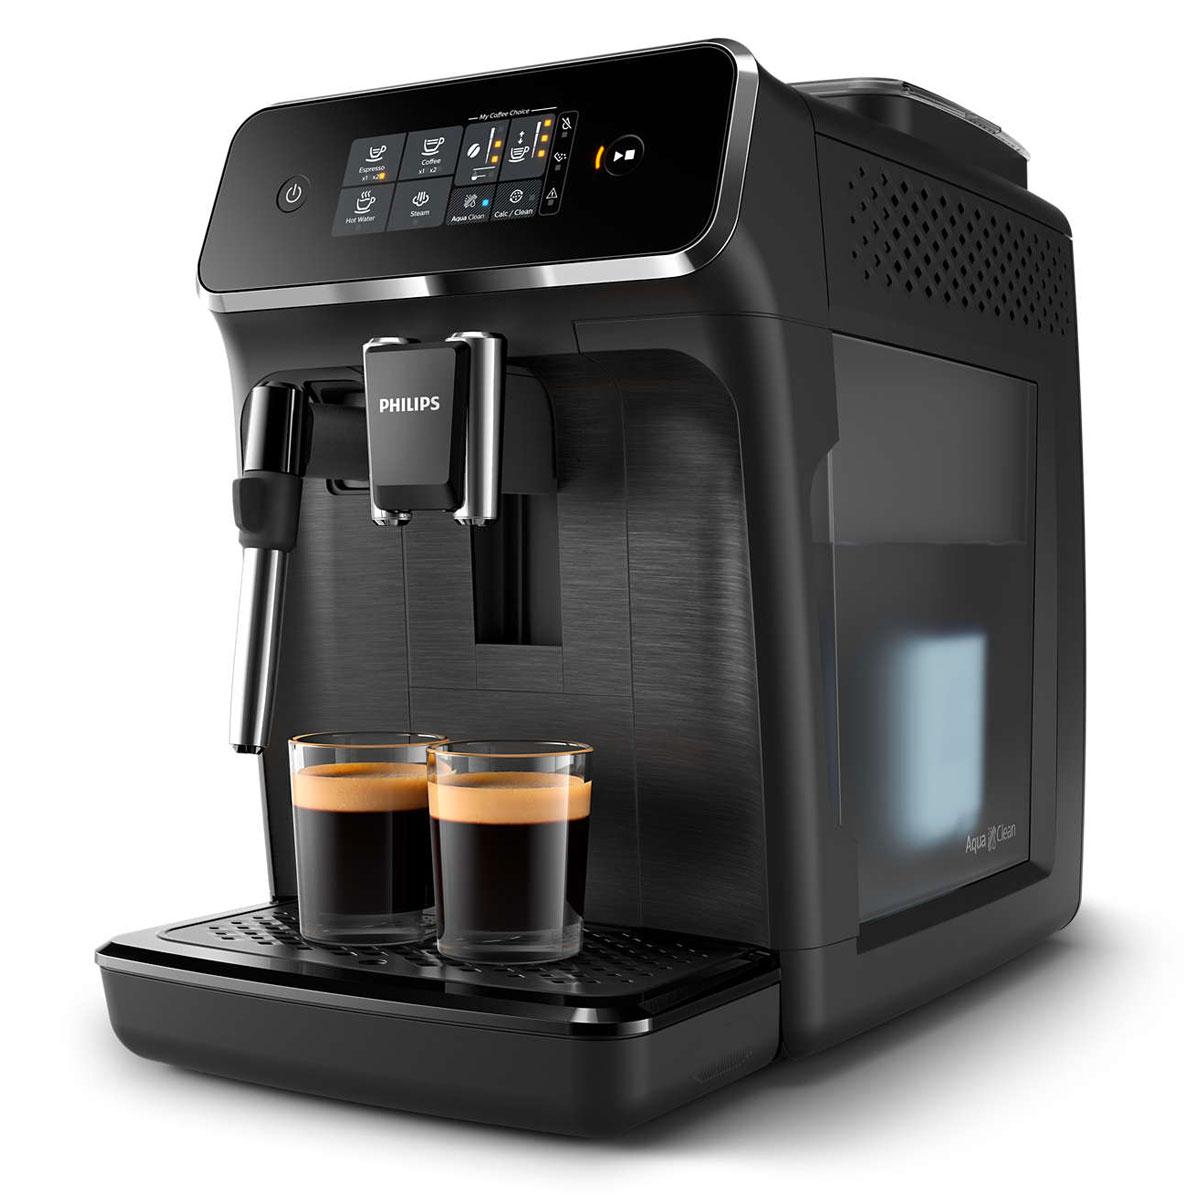 Philips / Saeco 2200 Series Classic Milk Frother Super Automatic Espresso Machine - EP2220/14